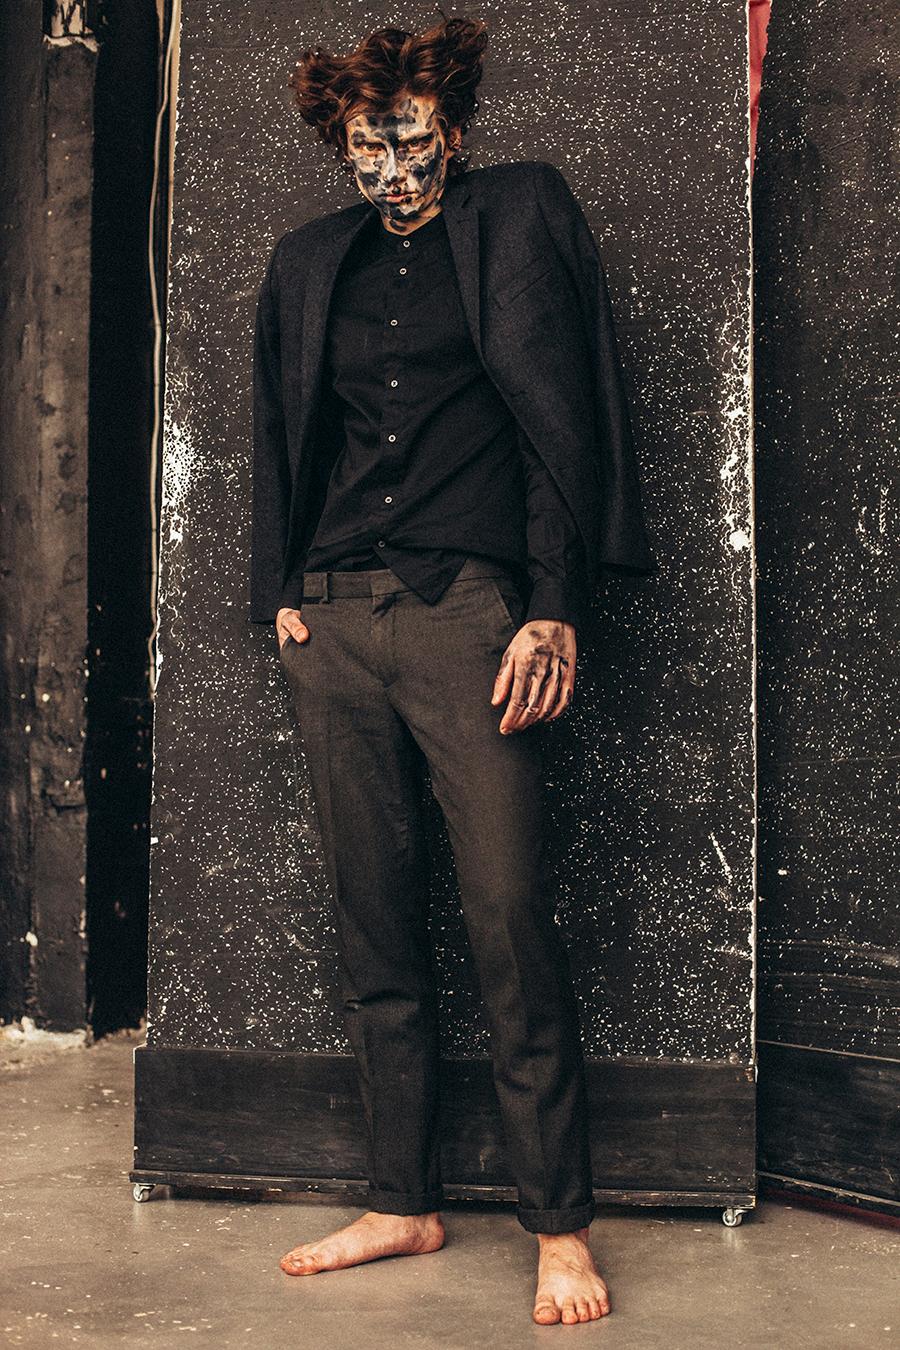 Jacket: Prada / Shirt: Saint Laurent / Trousers: Top Man